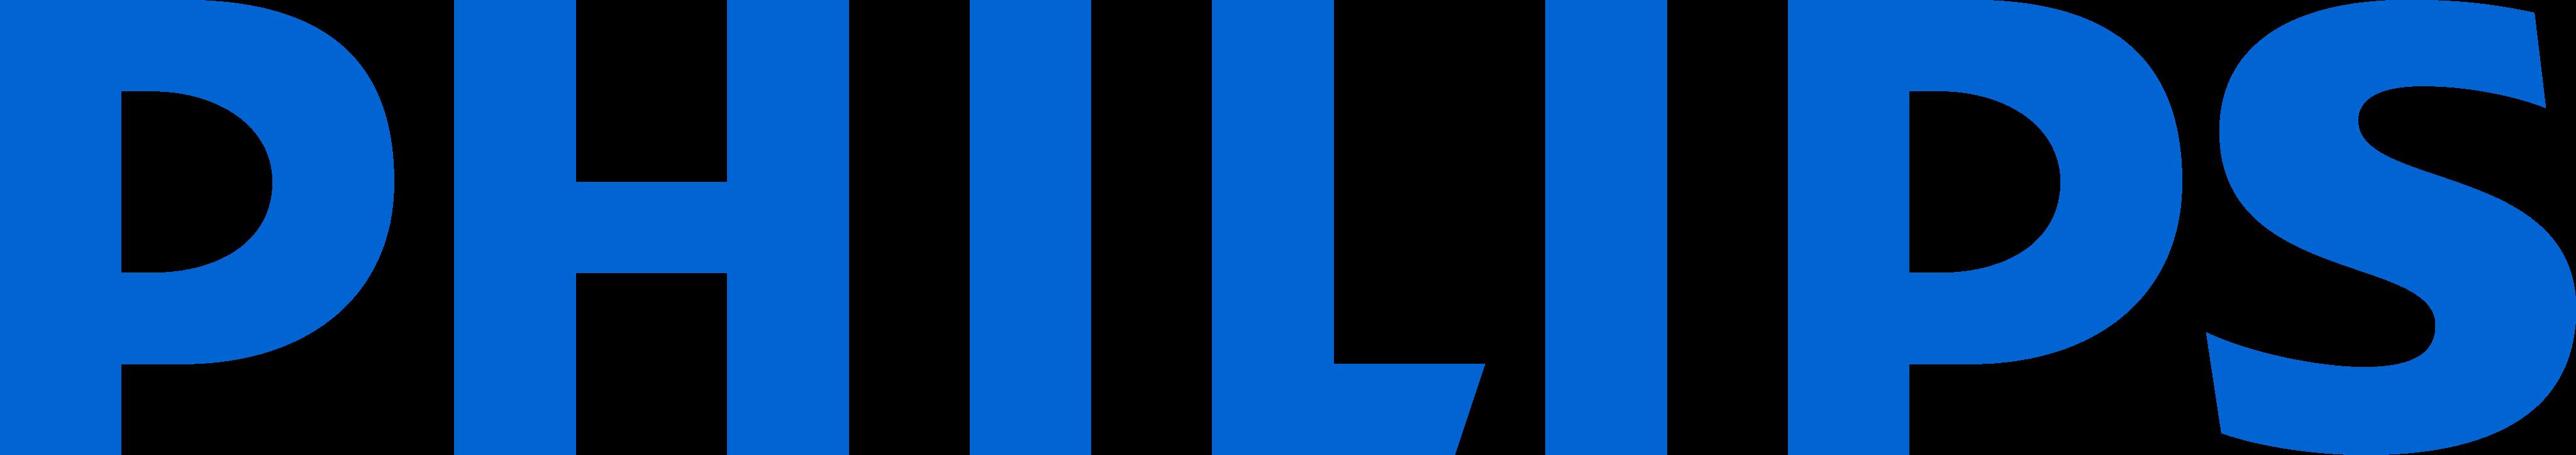 philips logo 1 - Philips Logo